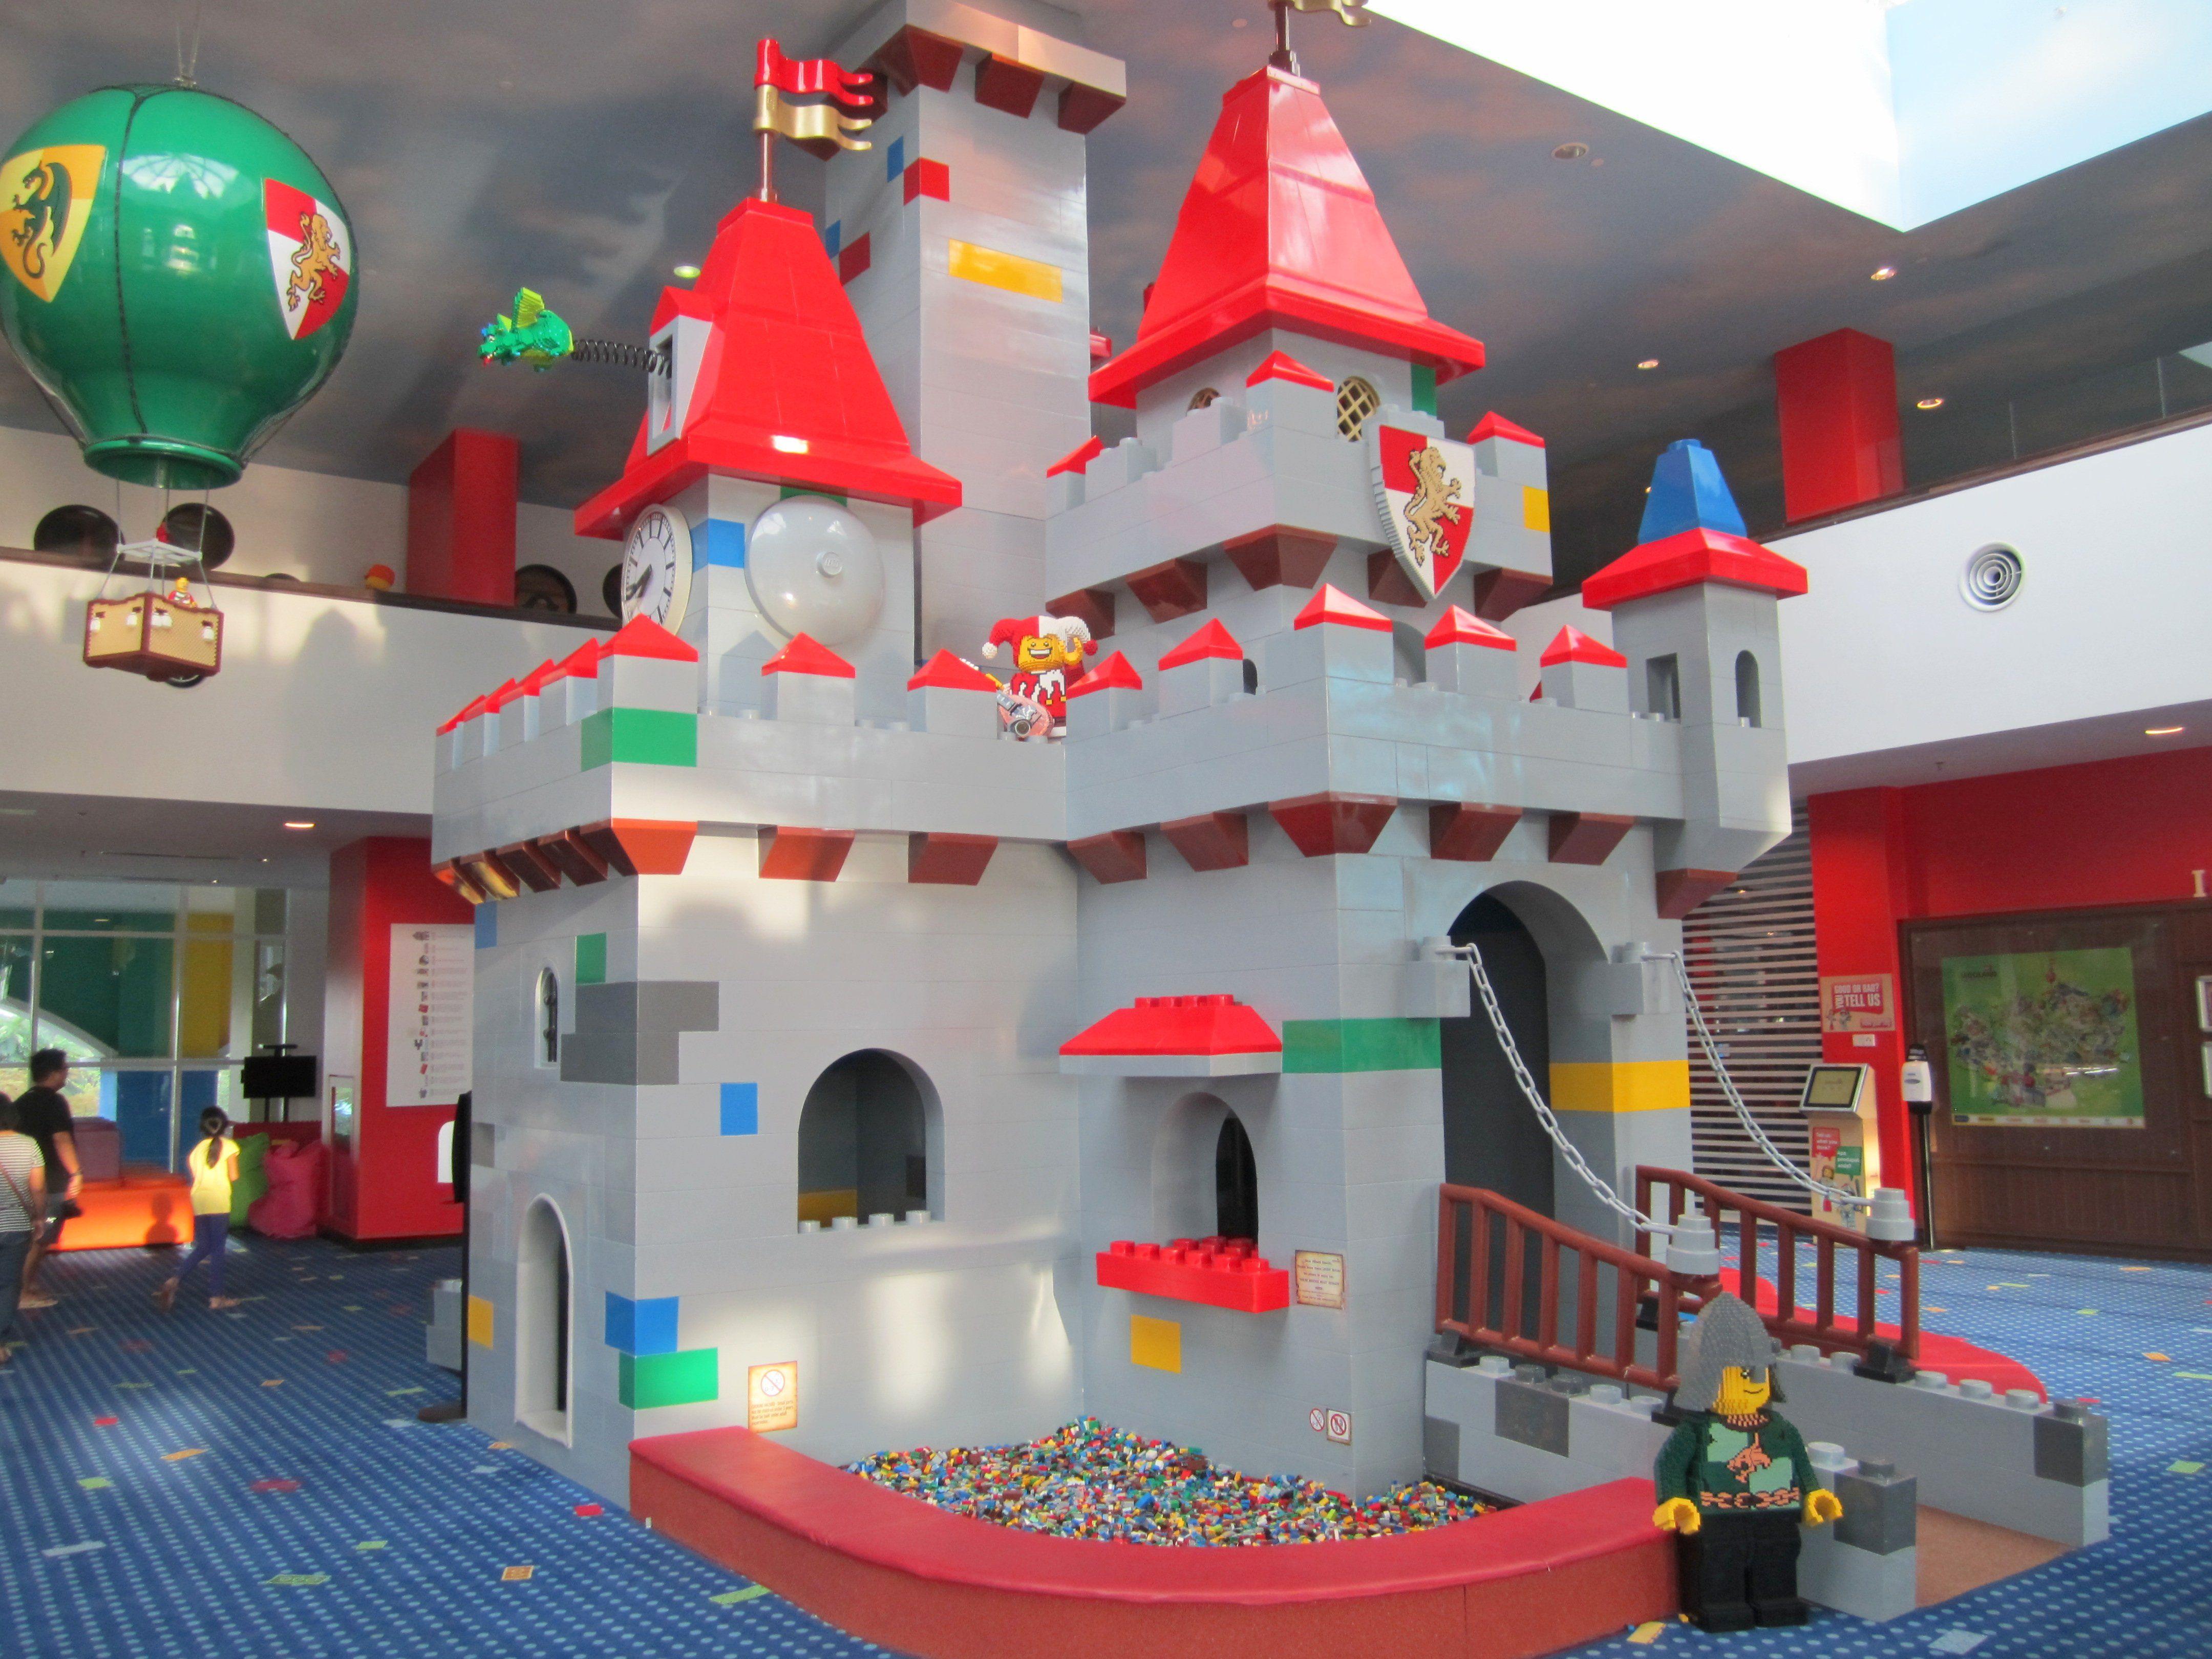 Review  Legoland Malaysia Hotel   Premium Adventure Themed Room. Review  Legoland Malaysia Hotel   Premium Adventure Themed Room